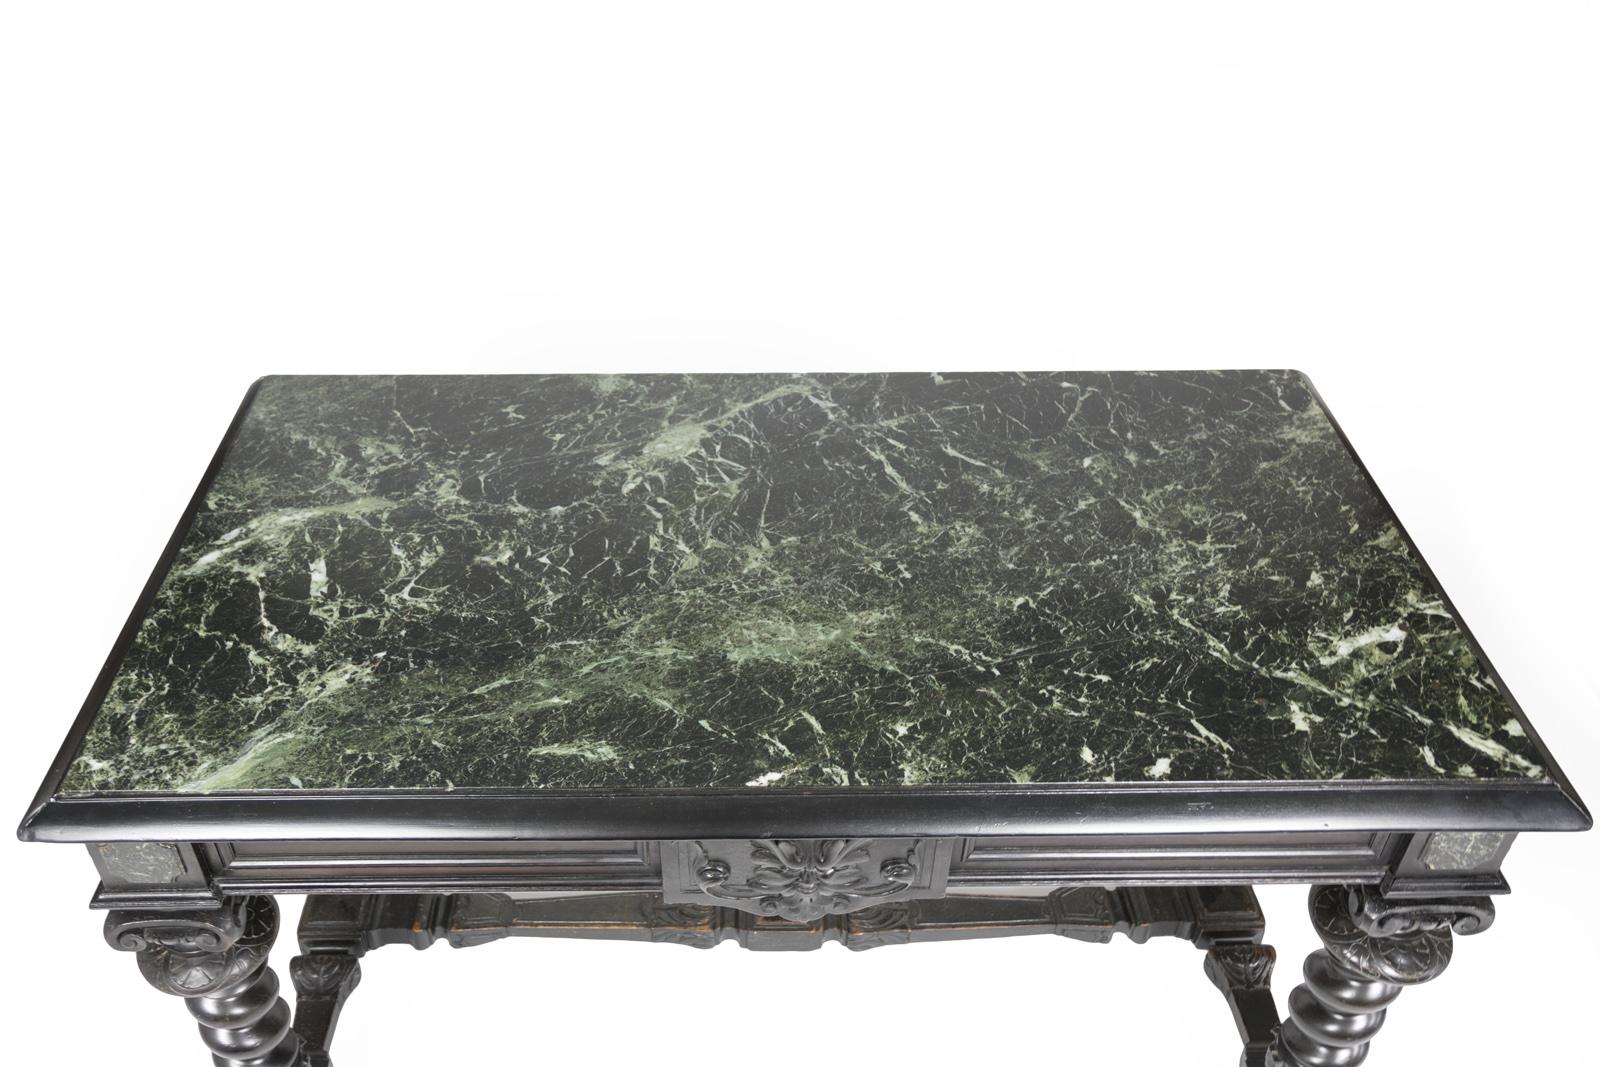 Excellent Baroque Inspired Ebonized Antique French Bureau Plat 415 355-1690 OX09